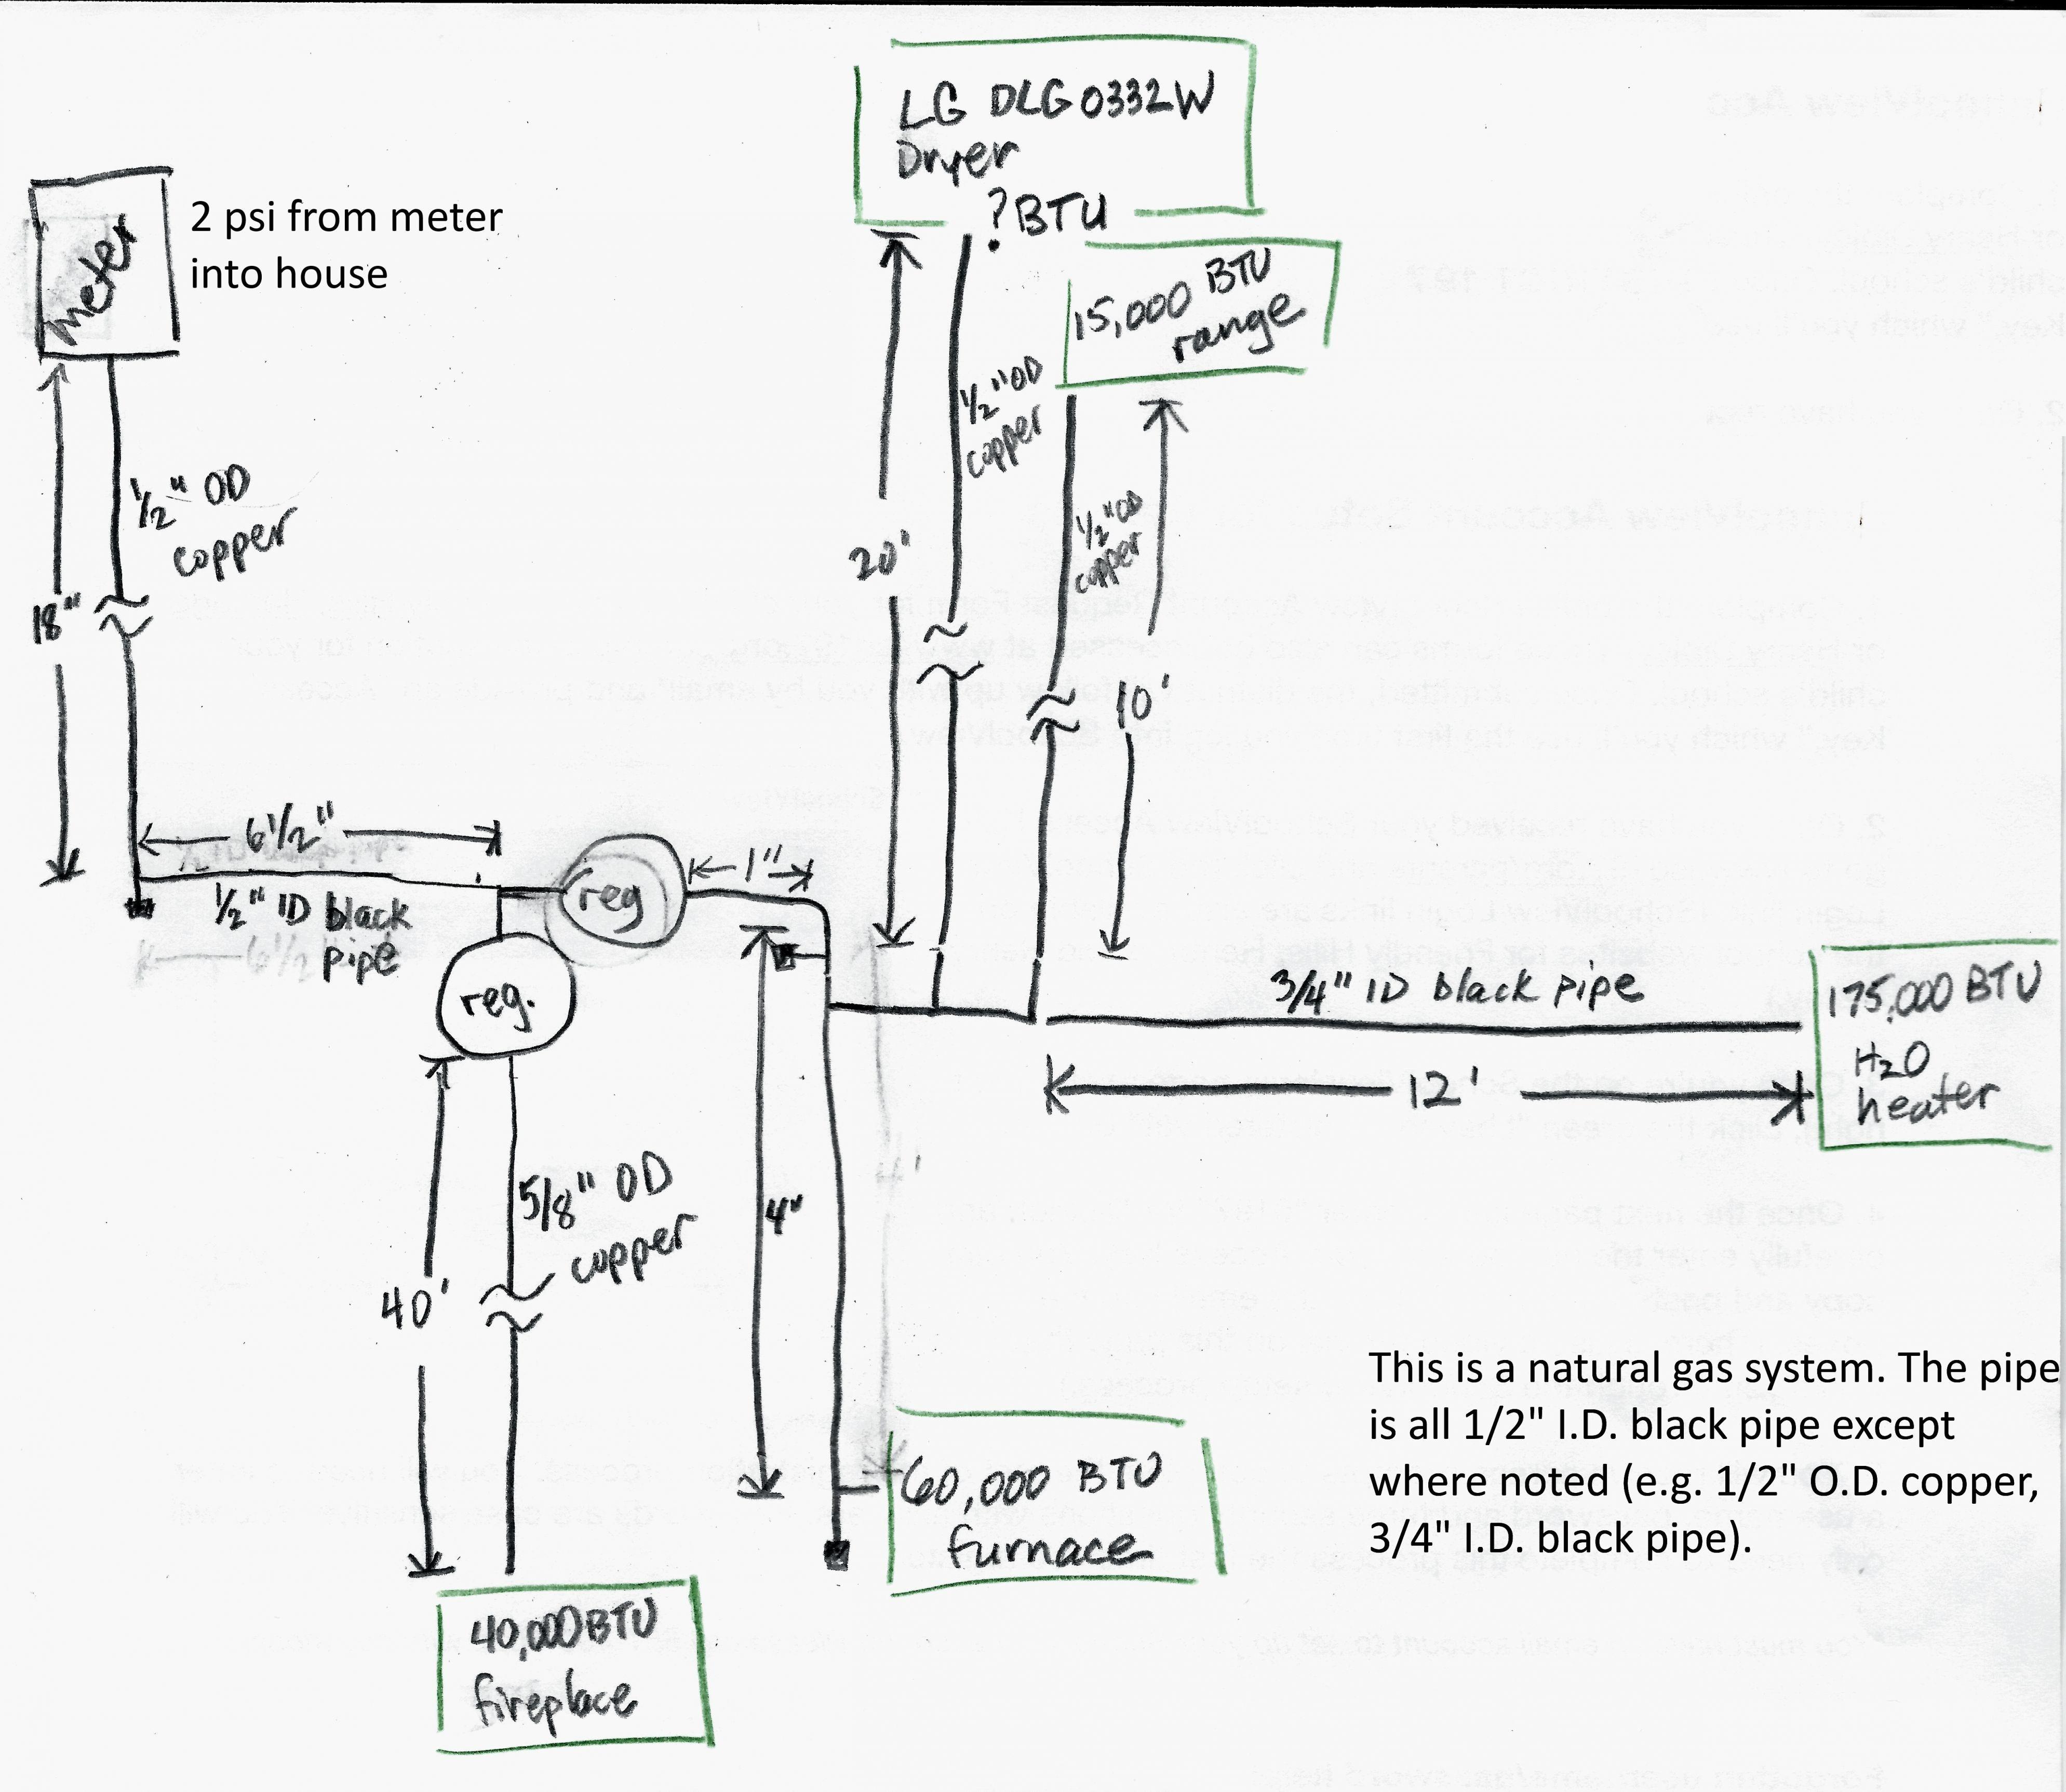 Immersion Heater Wiring Diagram | My Wiring DIagram on home heater wiring diagram, block heater wiring diagram, space heater wiring diagram, storage heater wiring diagram, infrared heater wiring diagram, water heater wiring diagram, baseboard heater thermostat wiring diagram, electric heater wiring diagram, coil heater wiring diagram, ceramic heater wiring diagram, duct heater wiring diagram,